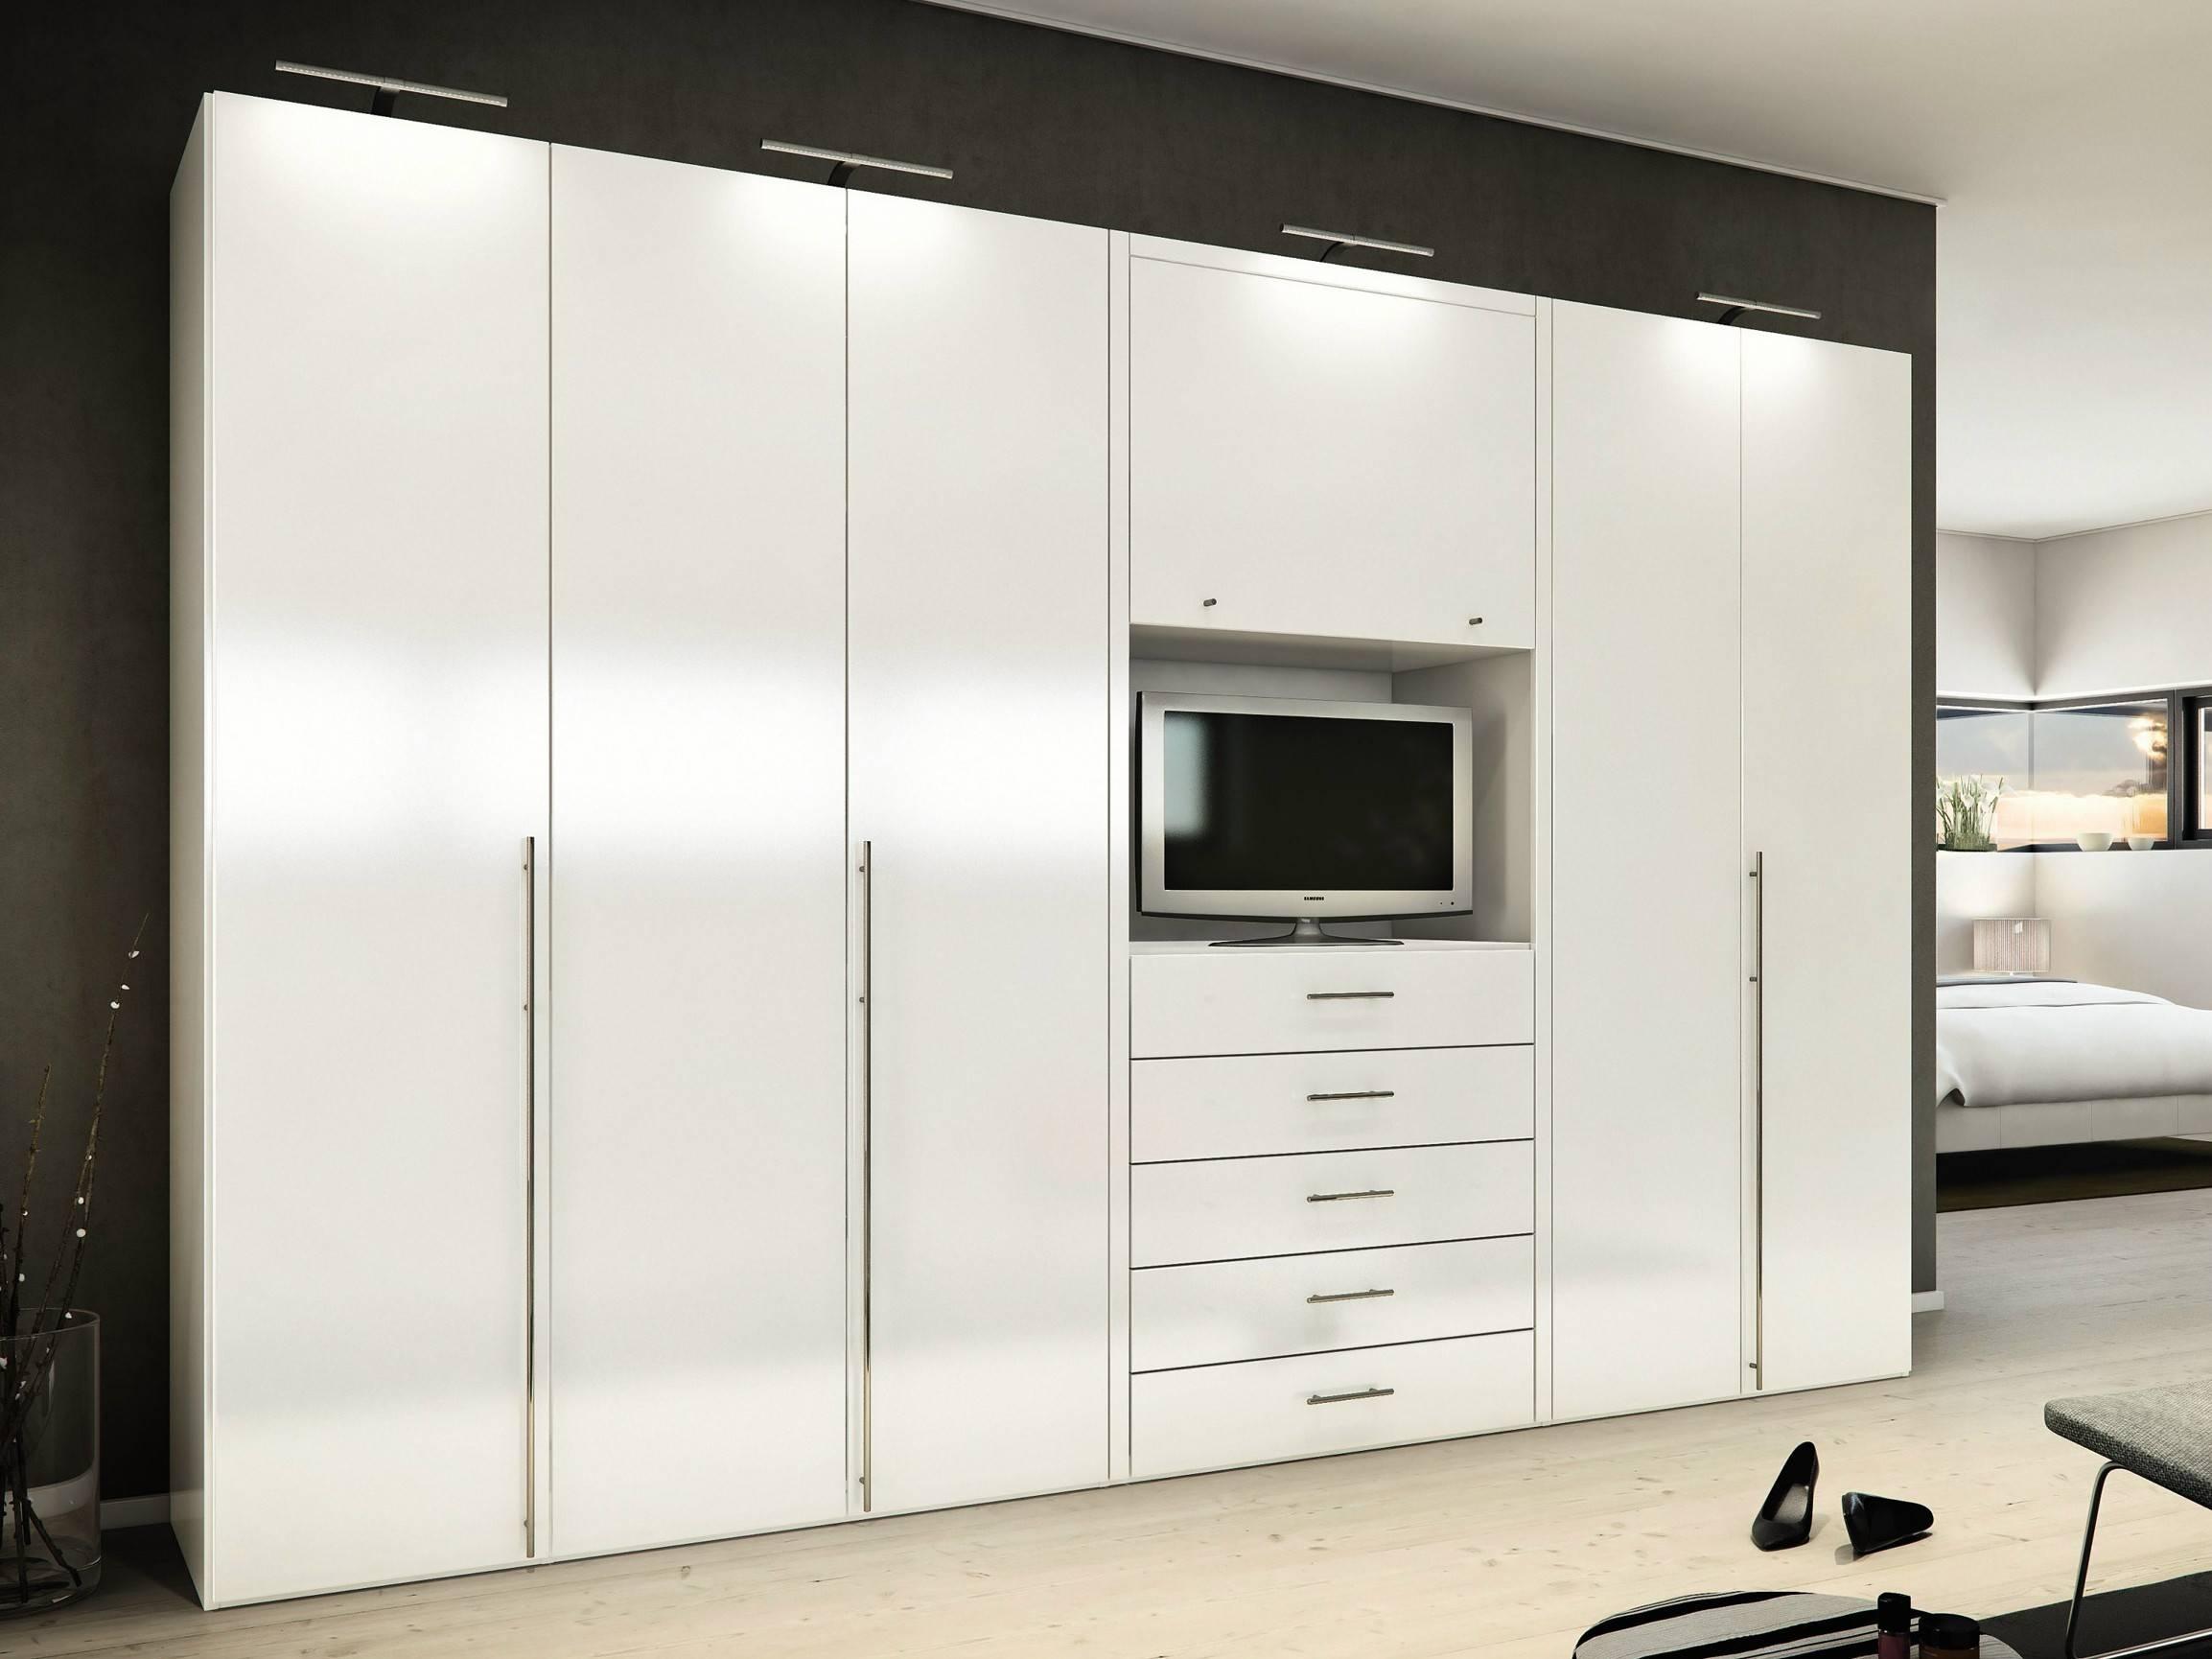 Wardrobe : White Wardrobe Closet With Sliding Doors Small White inside Cheap Wooden Wardrobes (Image 12 of 15)